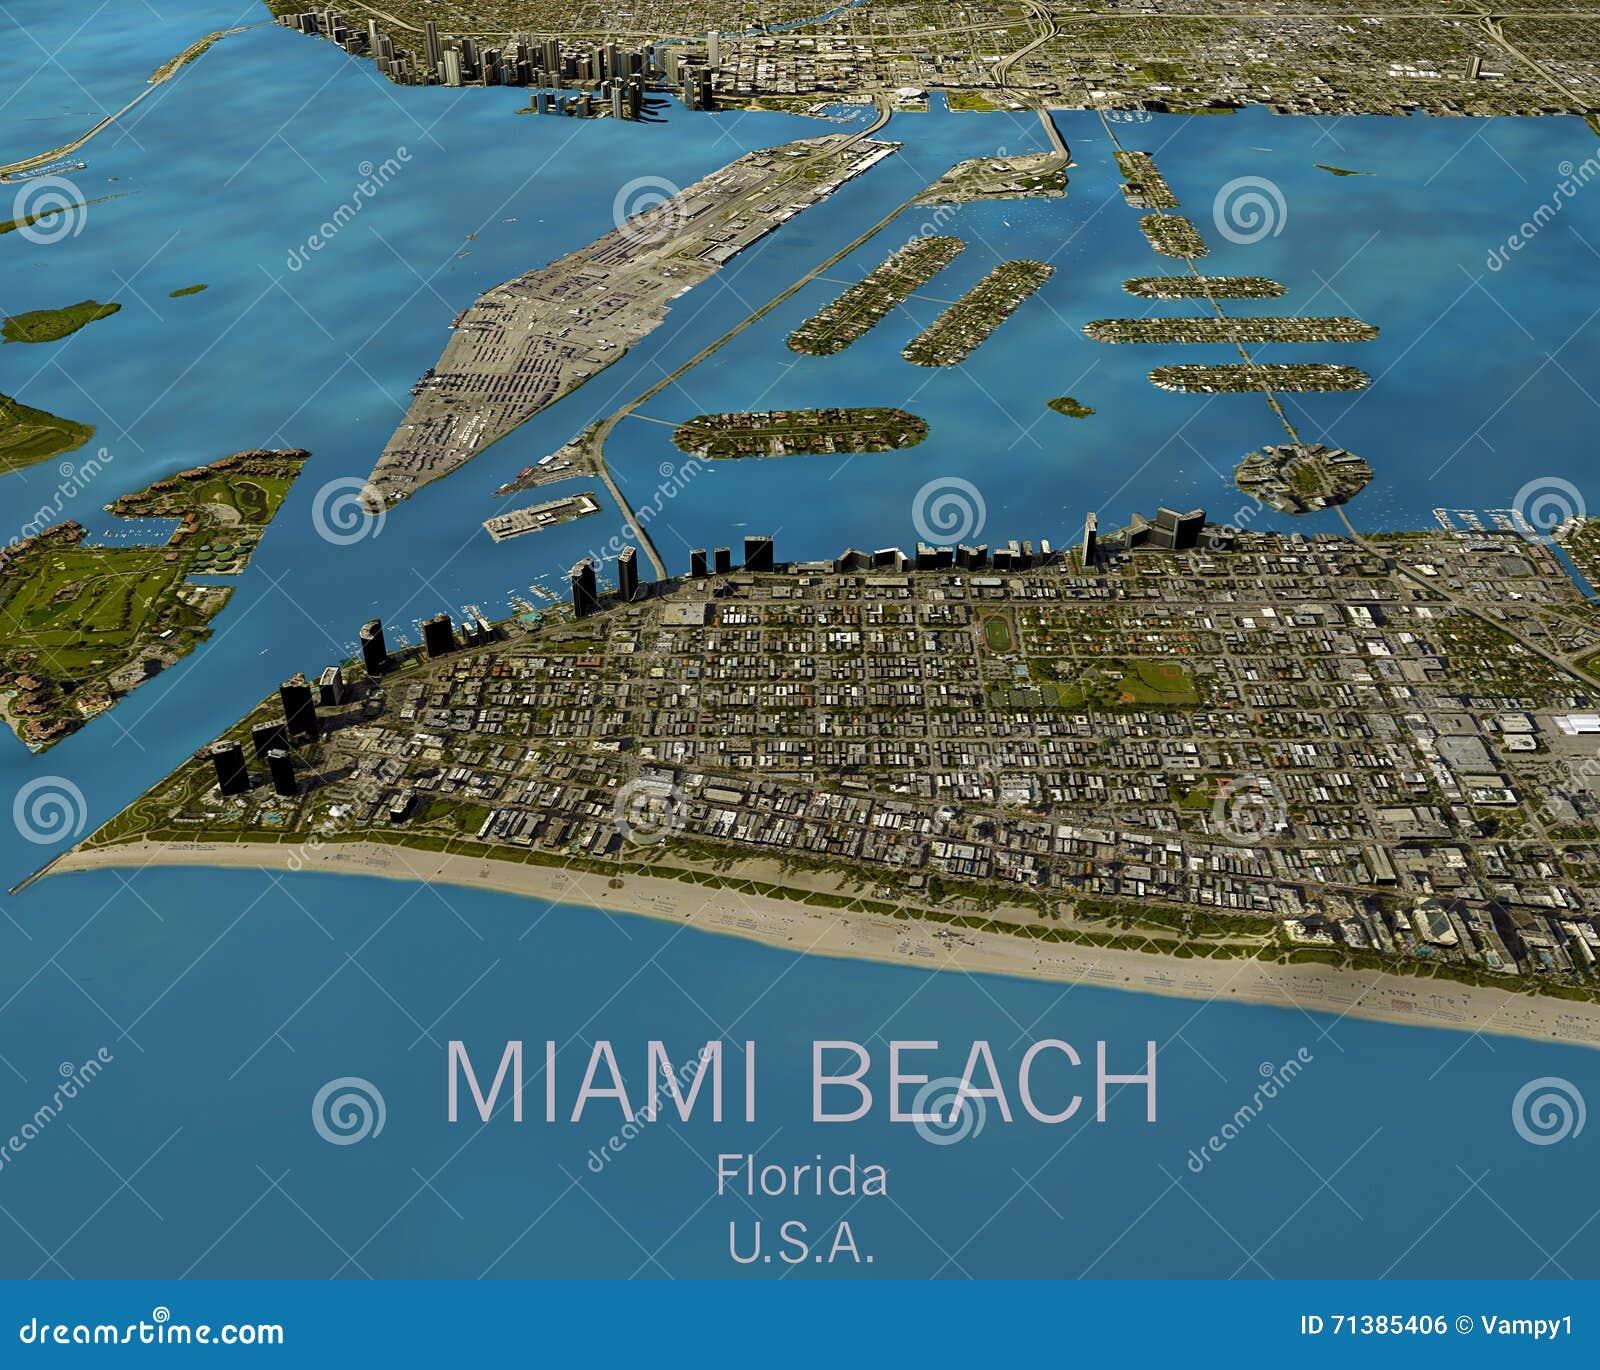 Miami Mapa Estados Unidos.Mapa De Miami Vision Por Satelite Estados Unidos Foto De